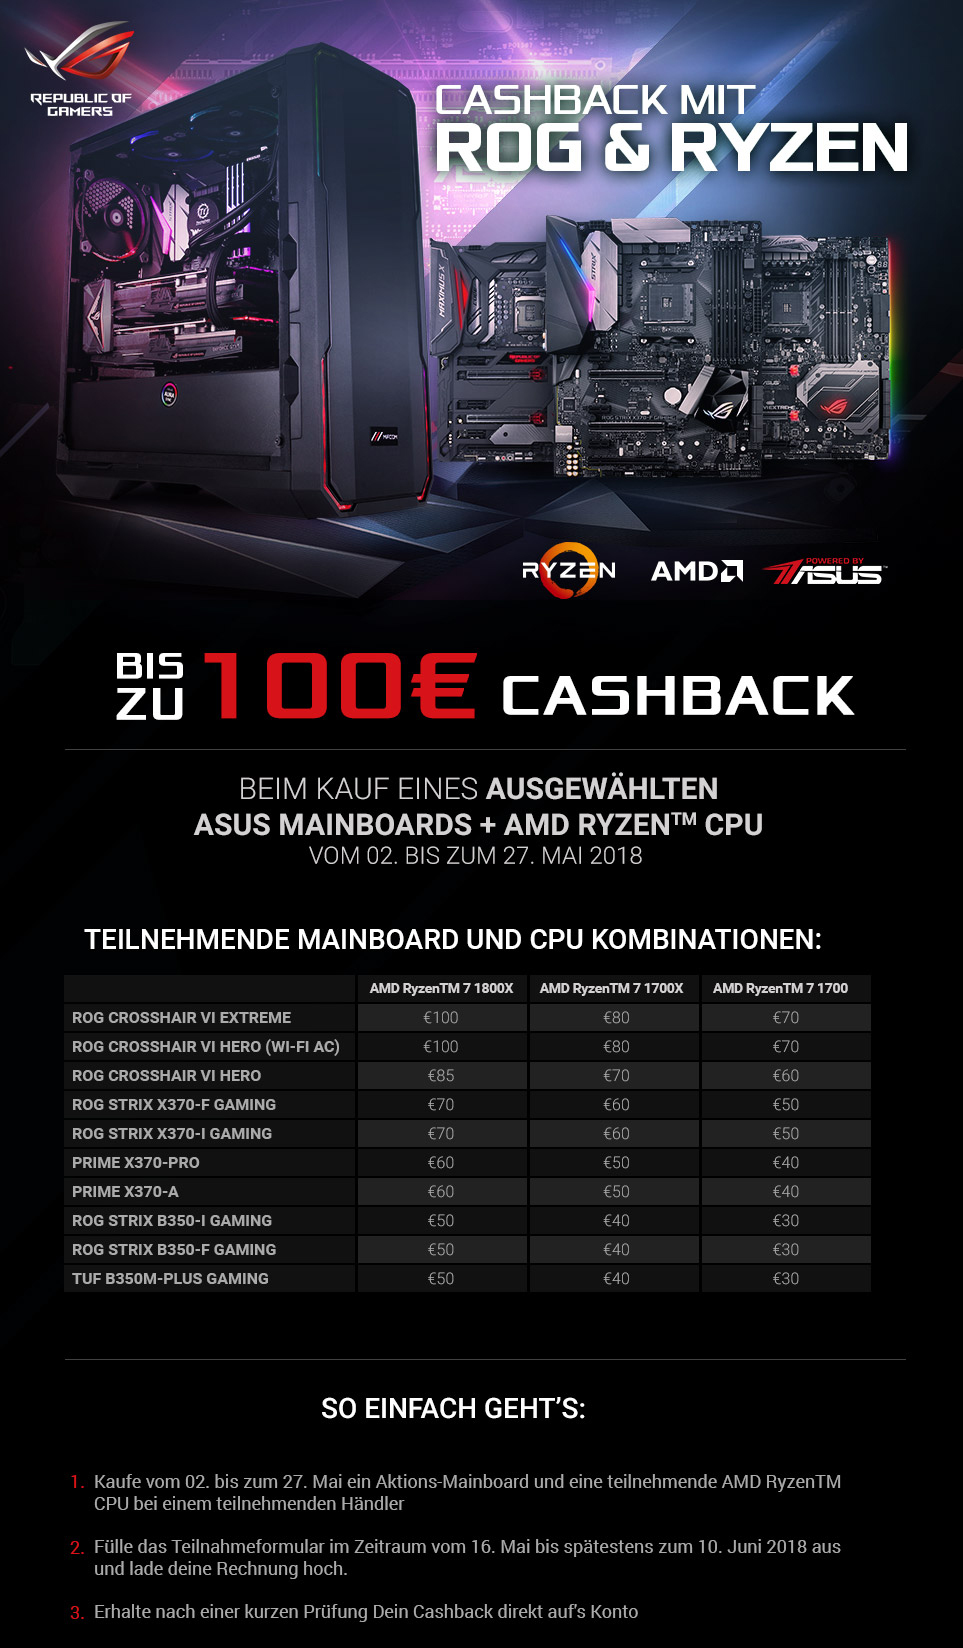 MIFCOM Gaming PCs mit ASUS + Ryzen Cashback